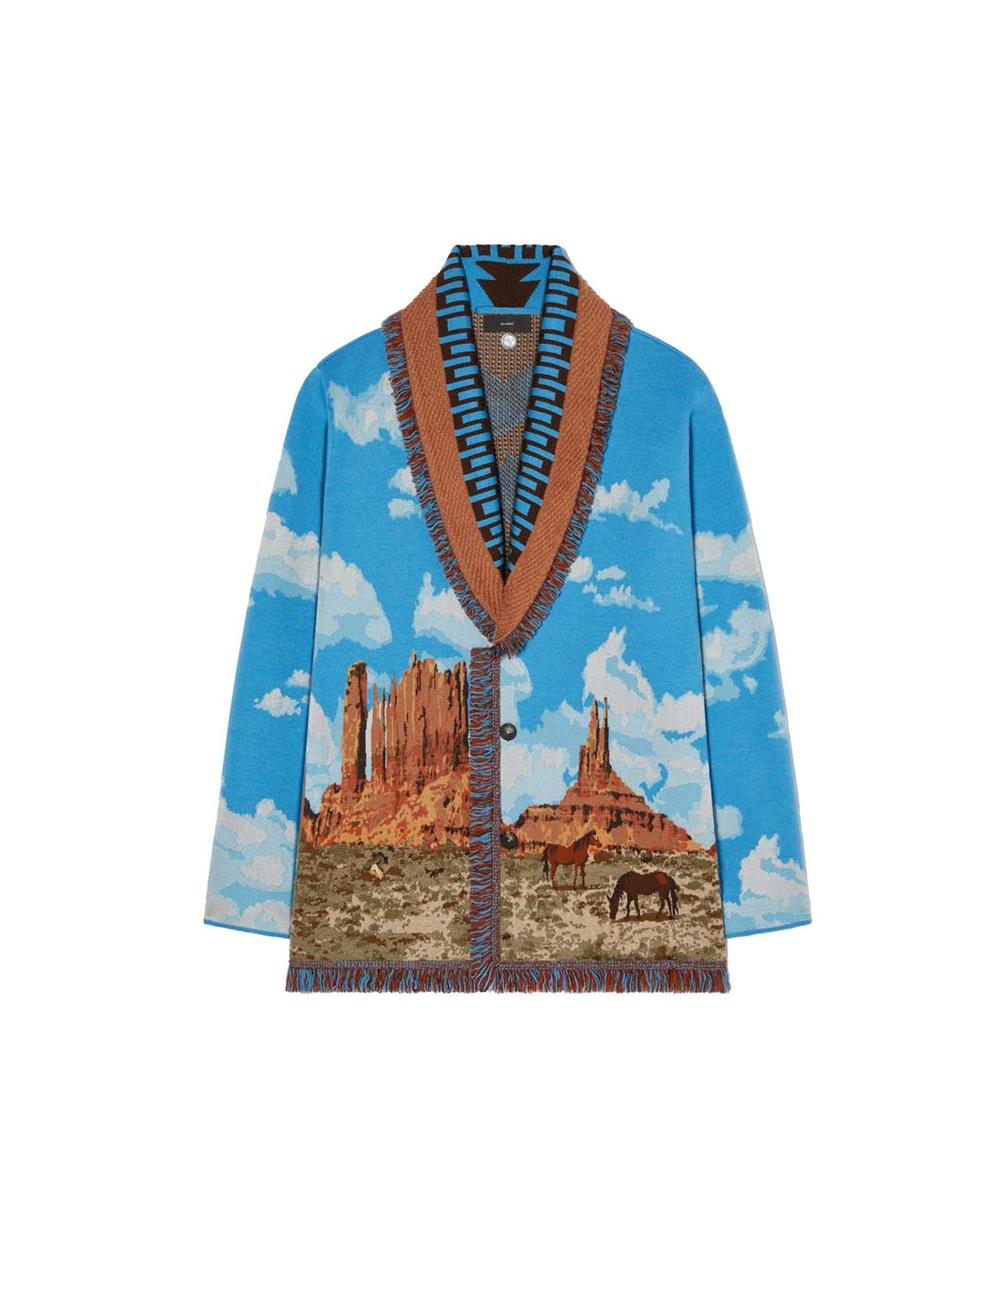 Monument valley cardigan Alanui - BIG BOSS MEGEVE